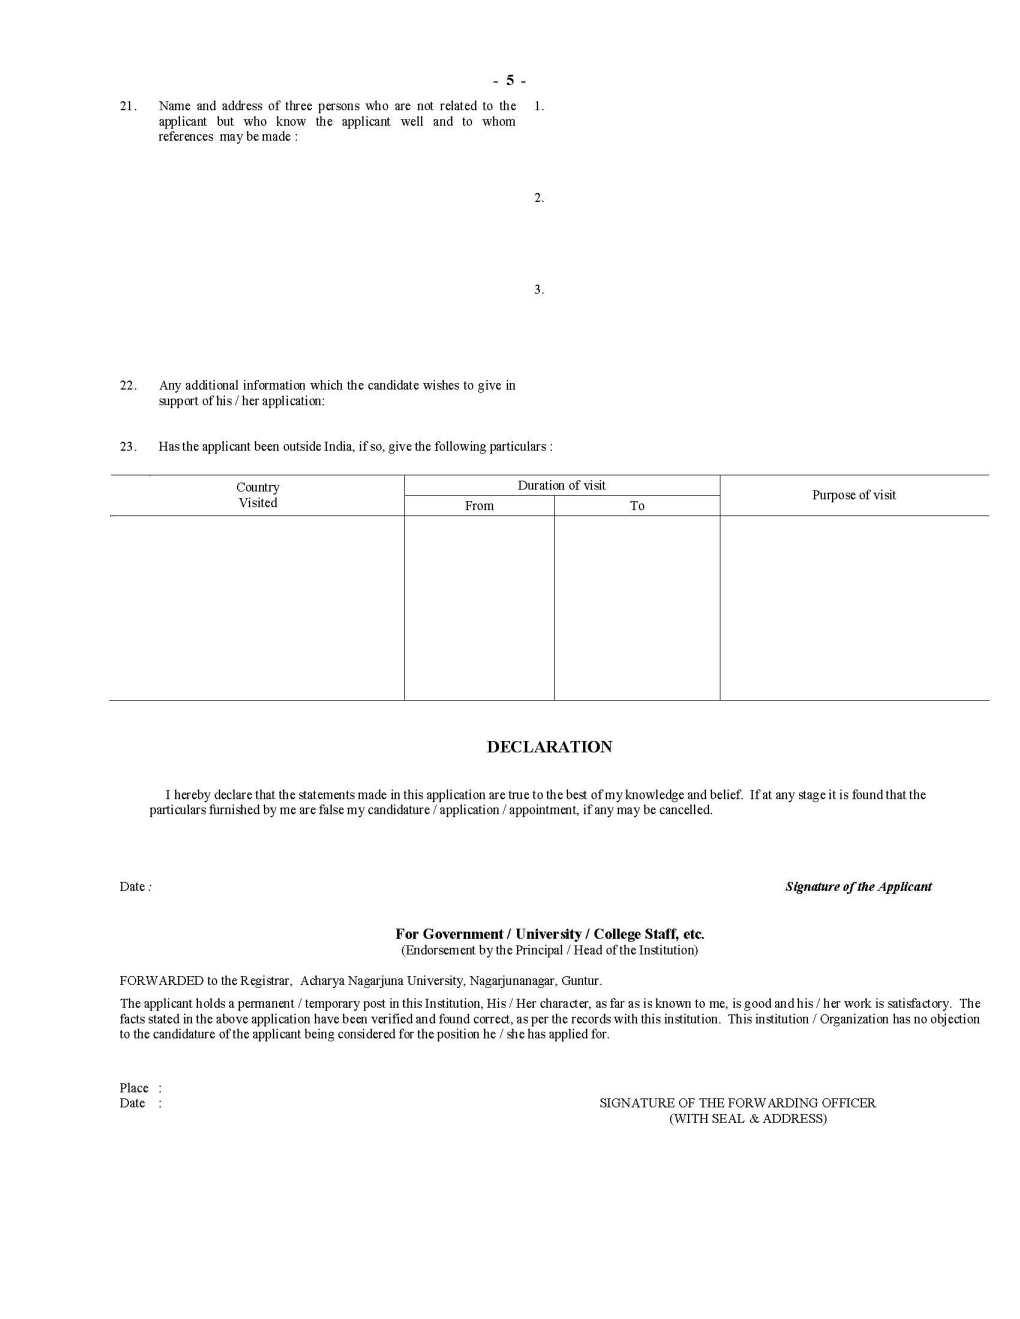 acharya nagarjuna university jobs 2017 2018 mba commerce business administration english education international business history archaeology law international business